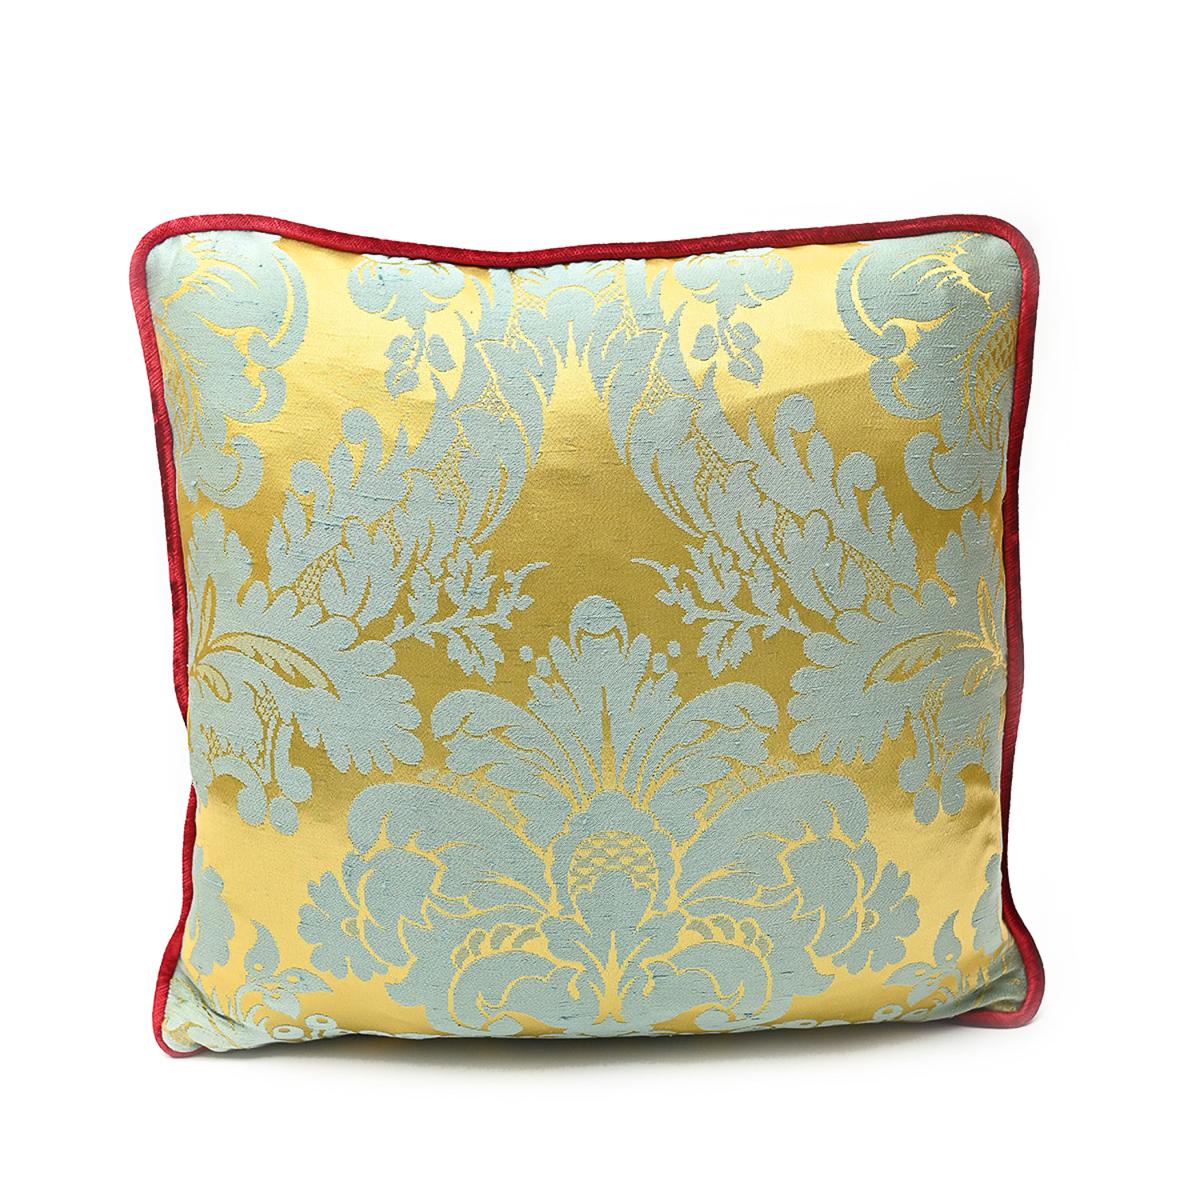 Pair Of Pillows, Seaside Town Pillows: 19 x 19